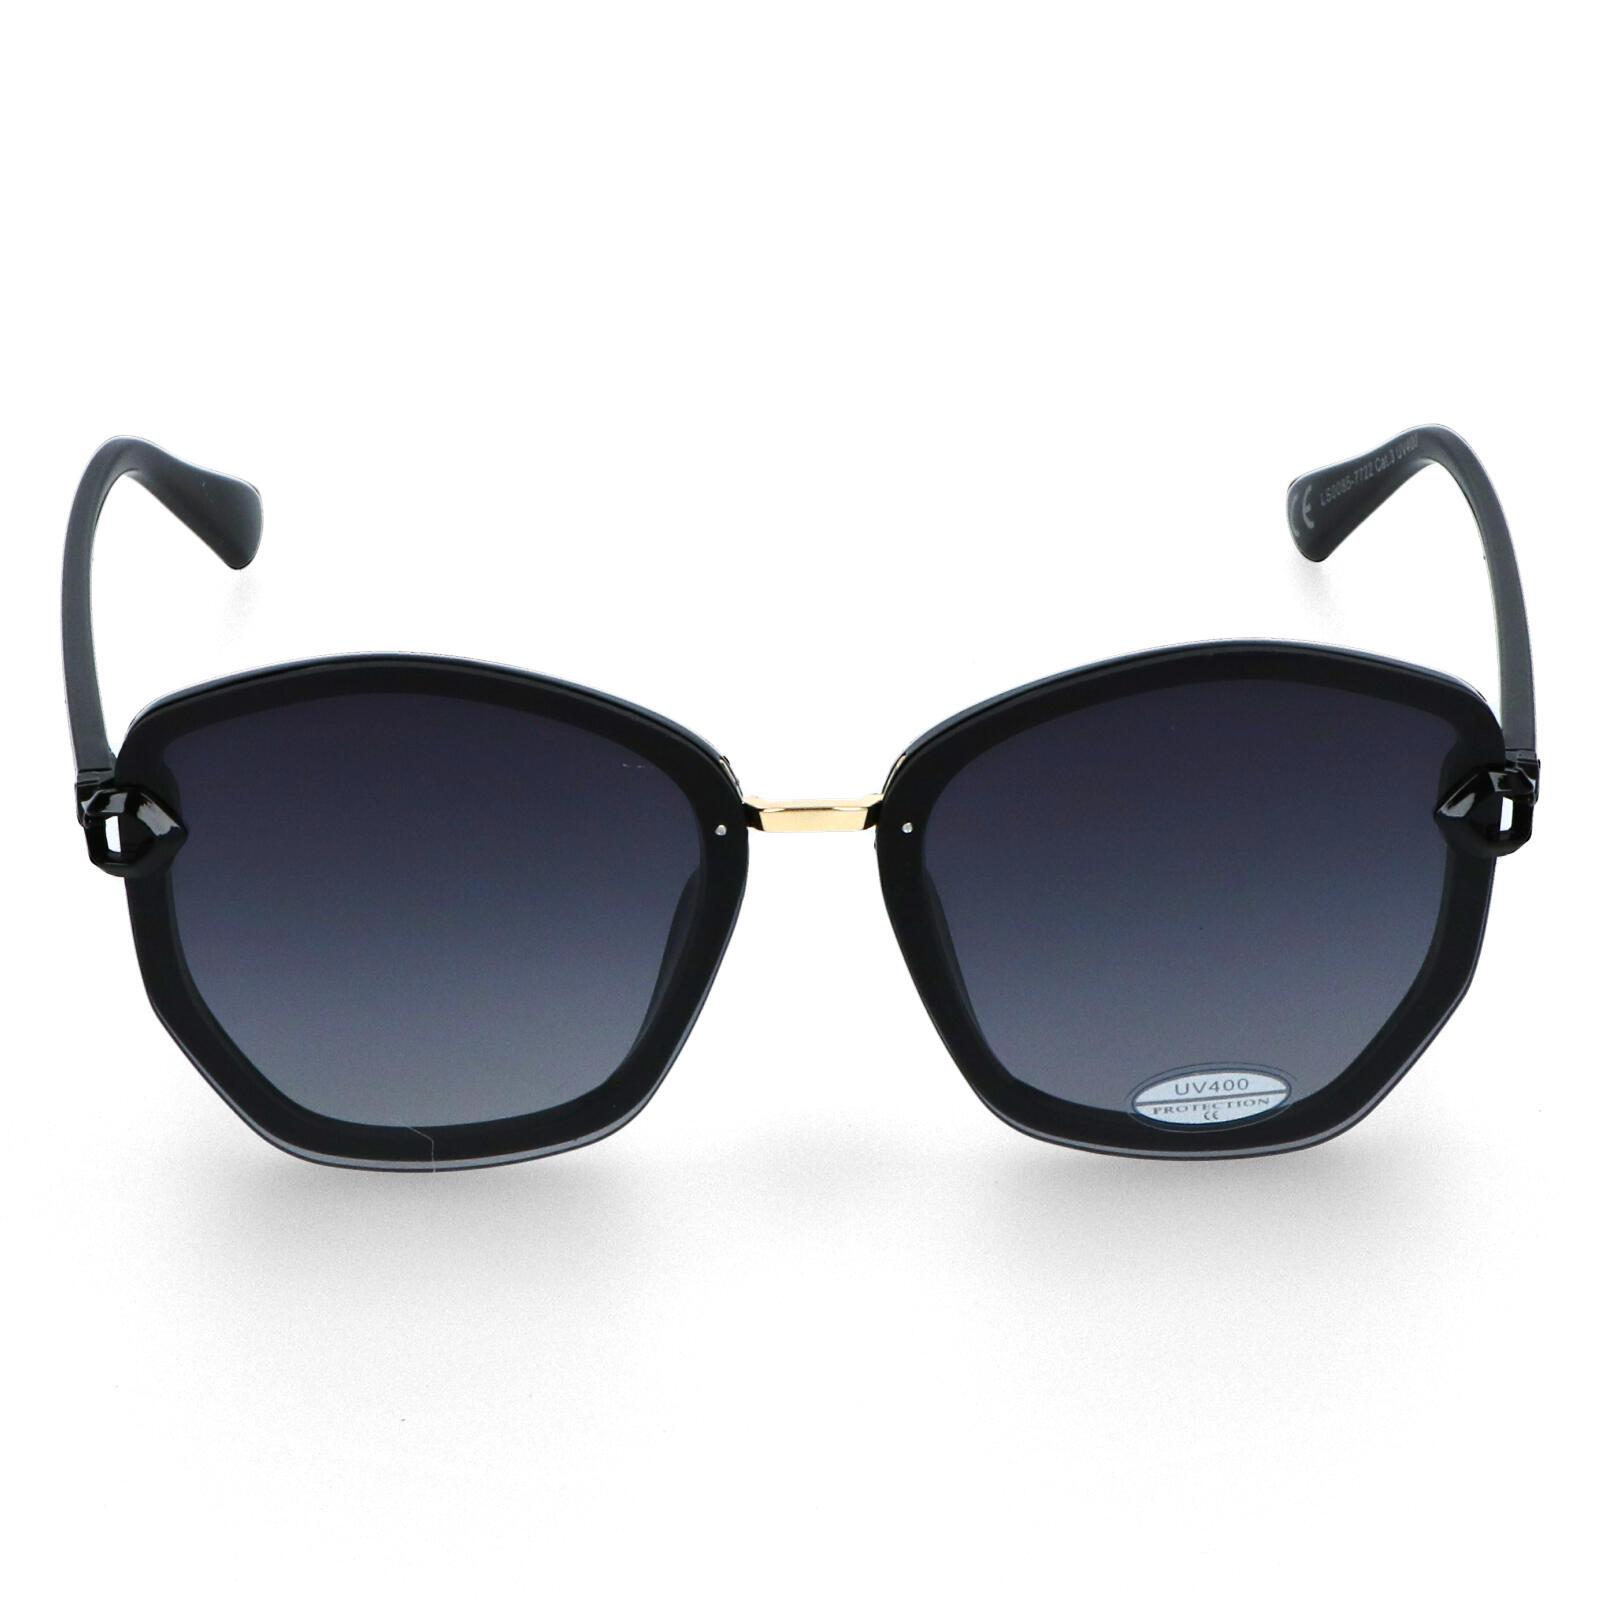 Dámske slnečné okuliare čierne - LS58